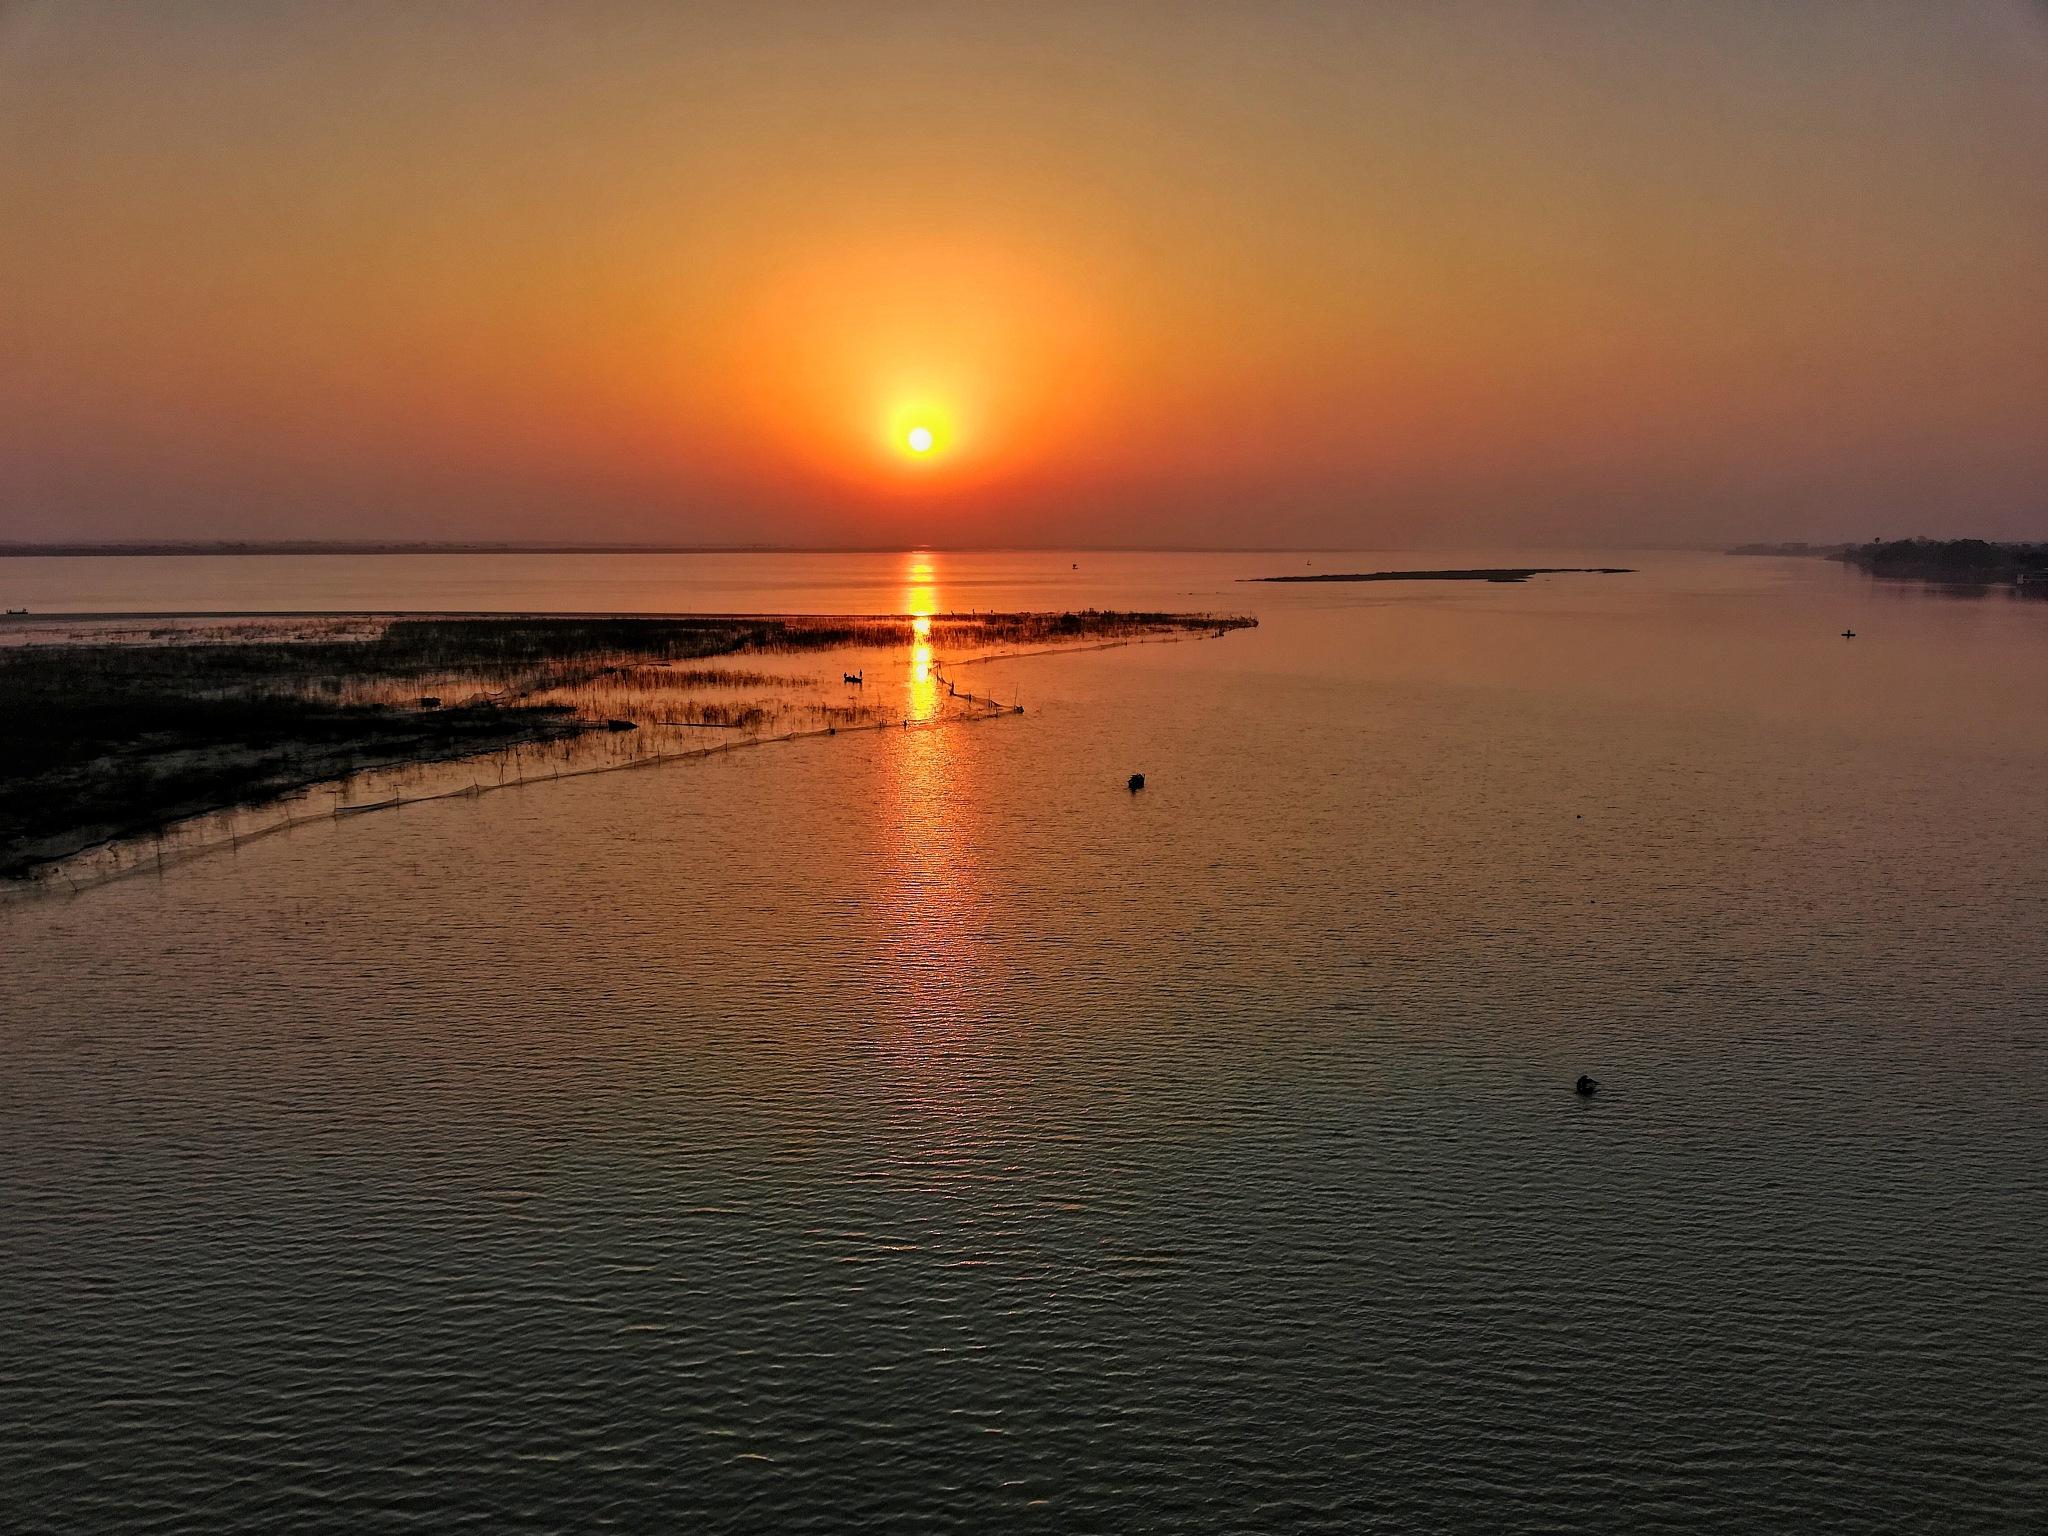 Sunrise by Shipram Aaryan